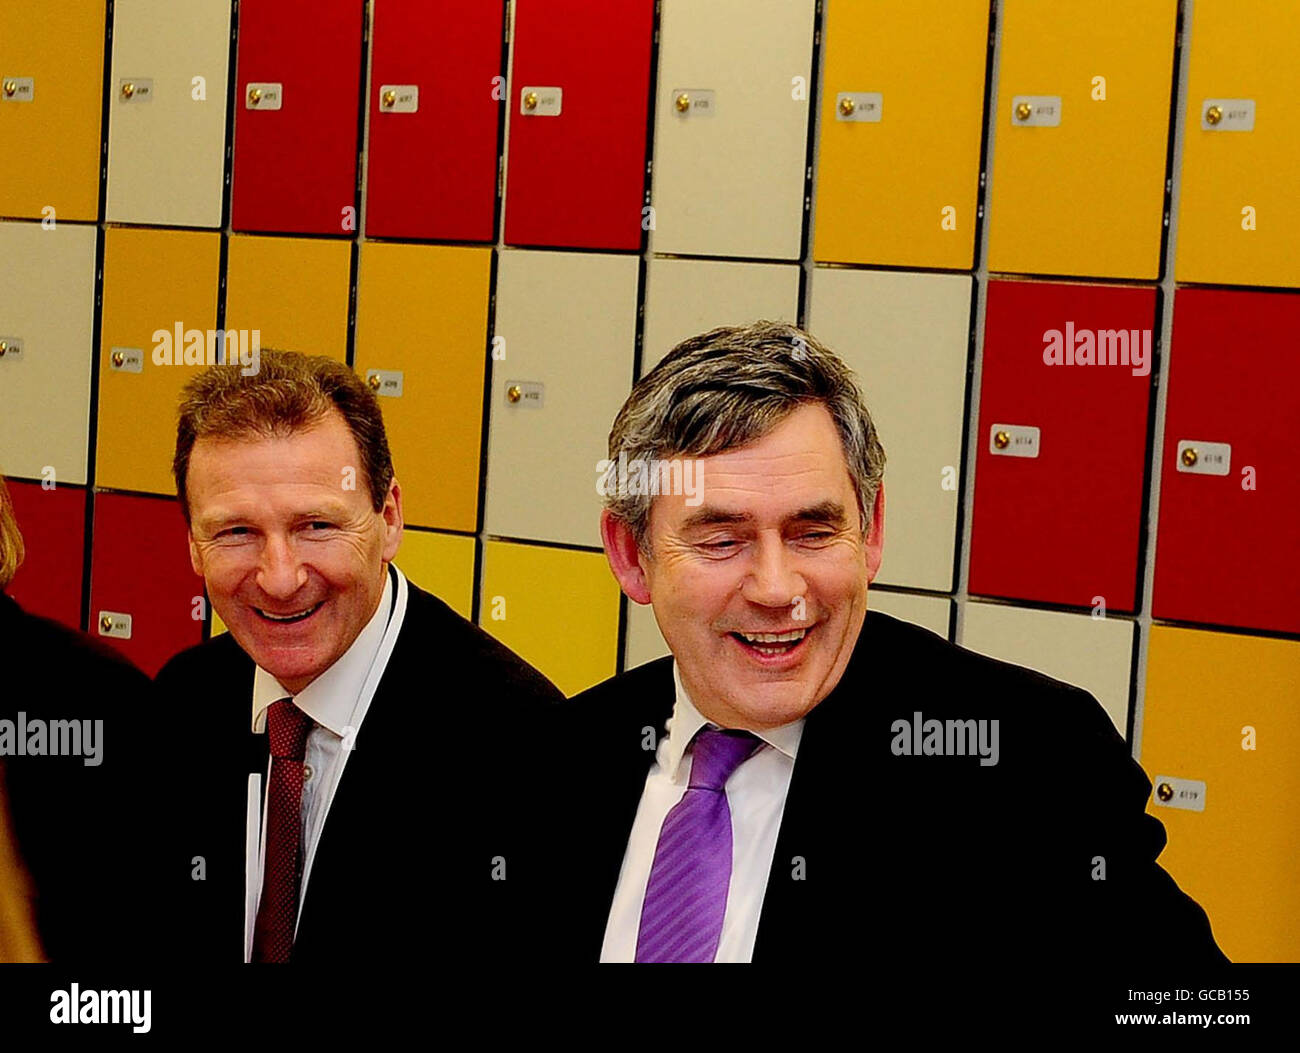 Regional Cabinet meeting Stock Photo